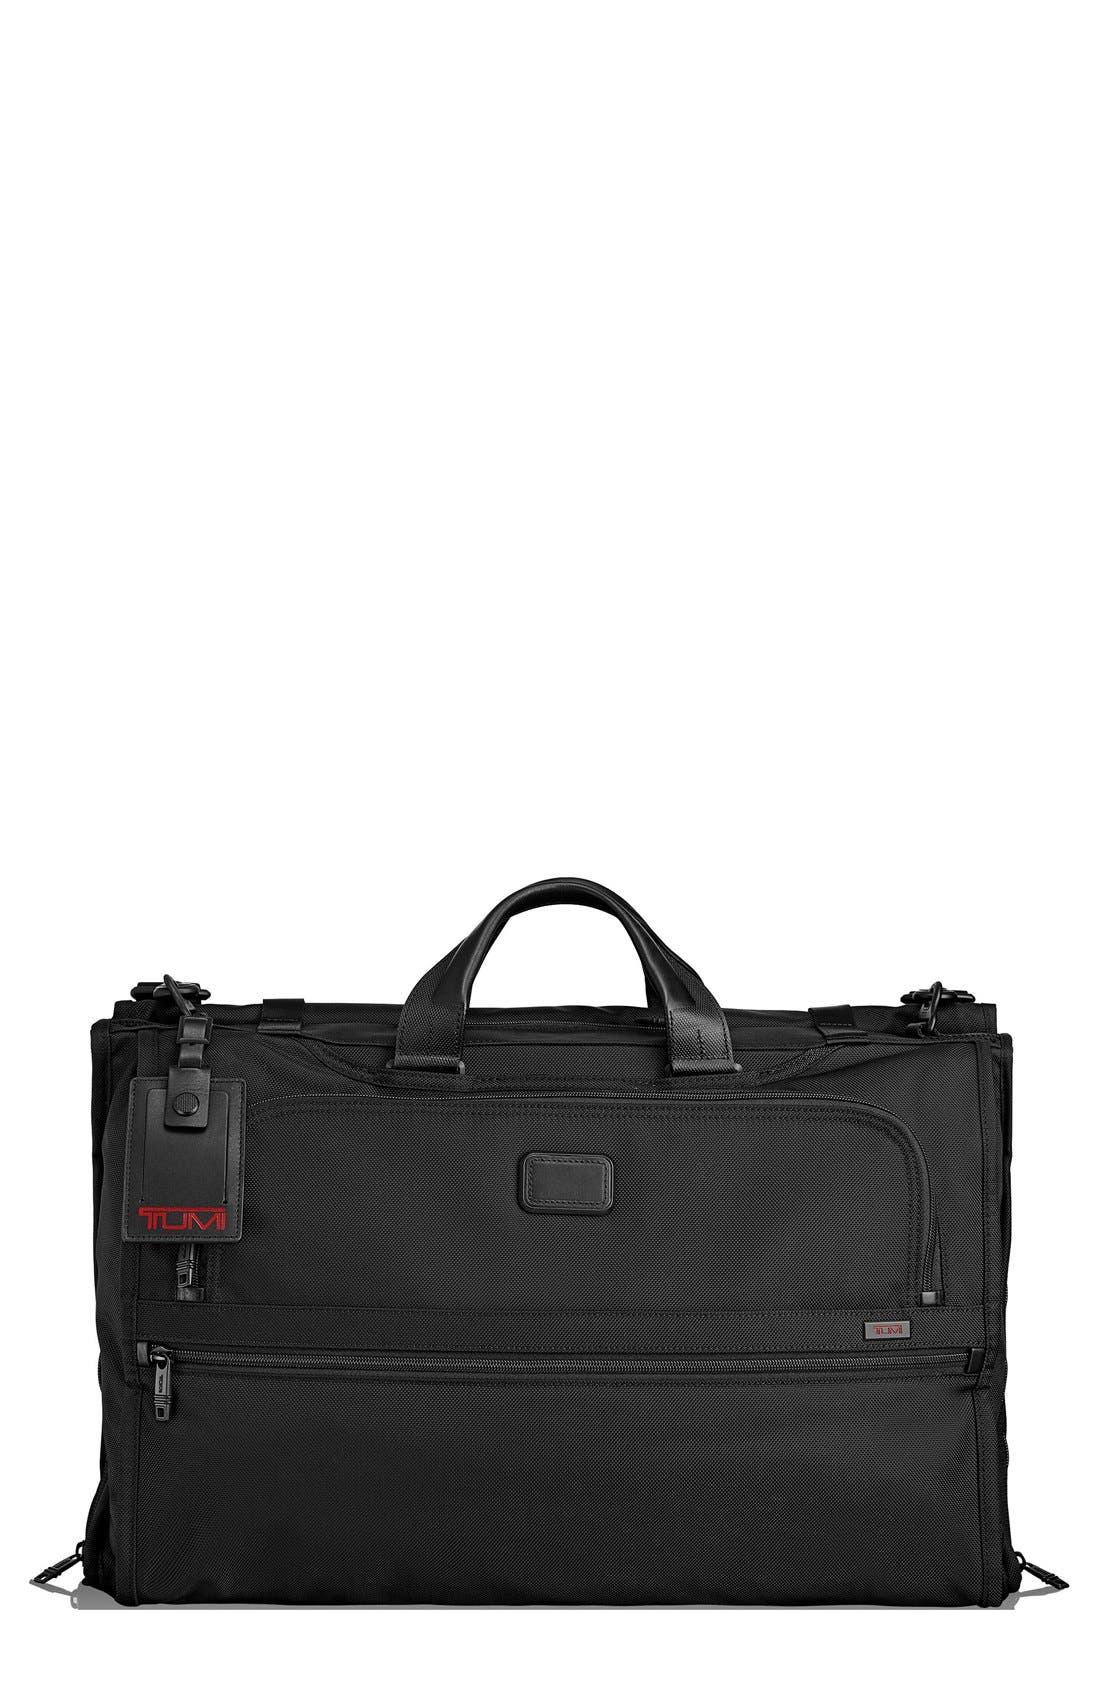 Alpha 2 22-Inch Trifold Carry-On Garment Bag,                         Main,                         color, BLACK